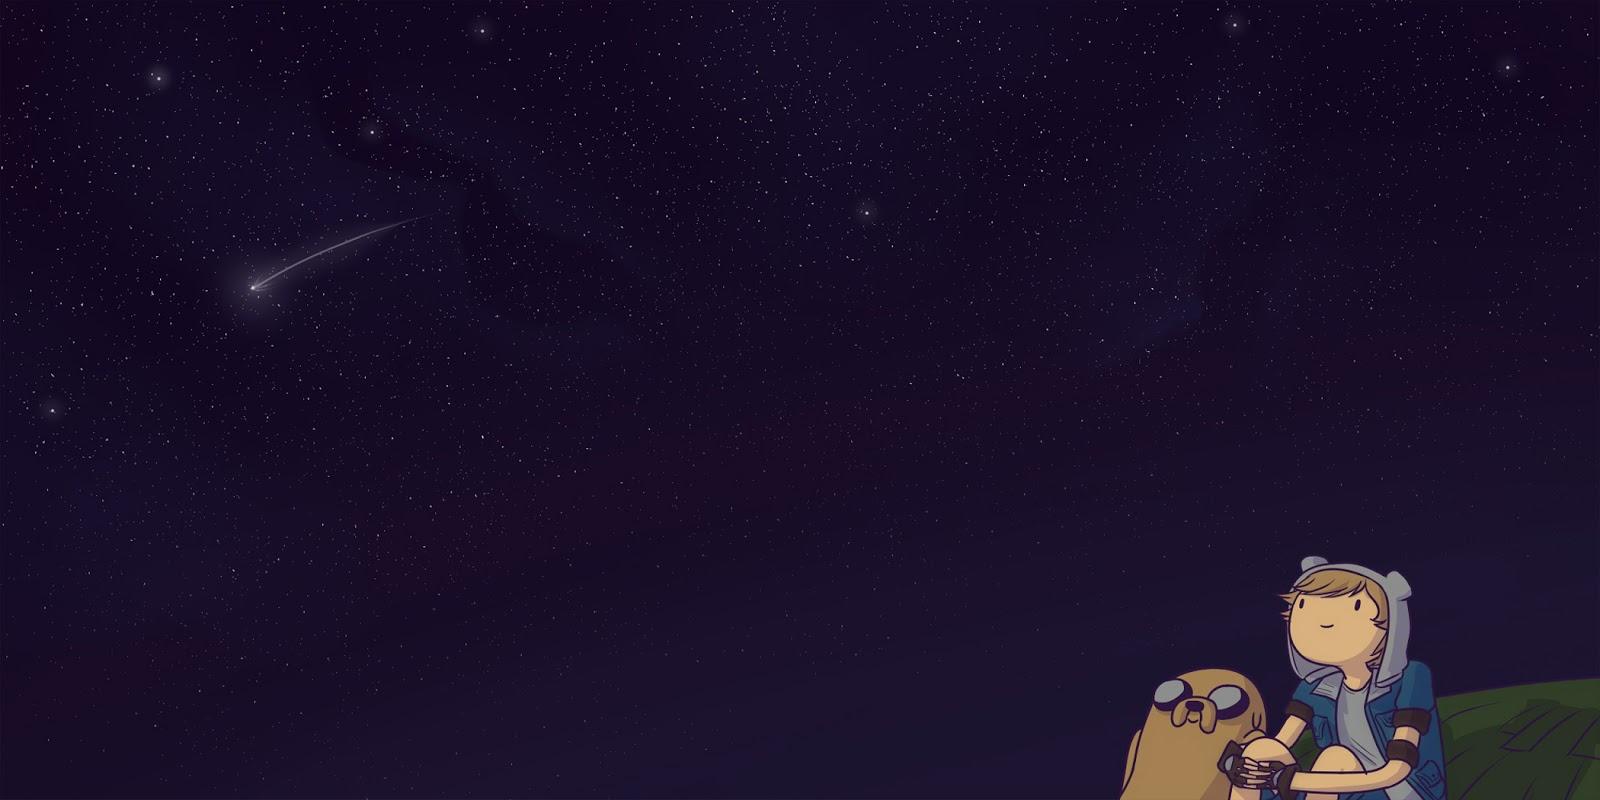 Night Sky Shooting Stars Scenery HD Wallpaper Desktop PC Background 1600x800